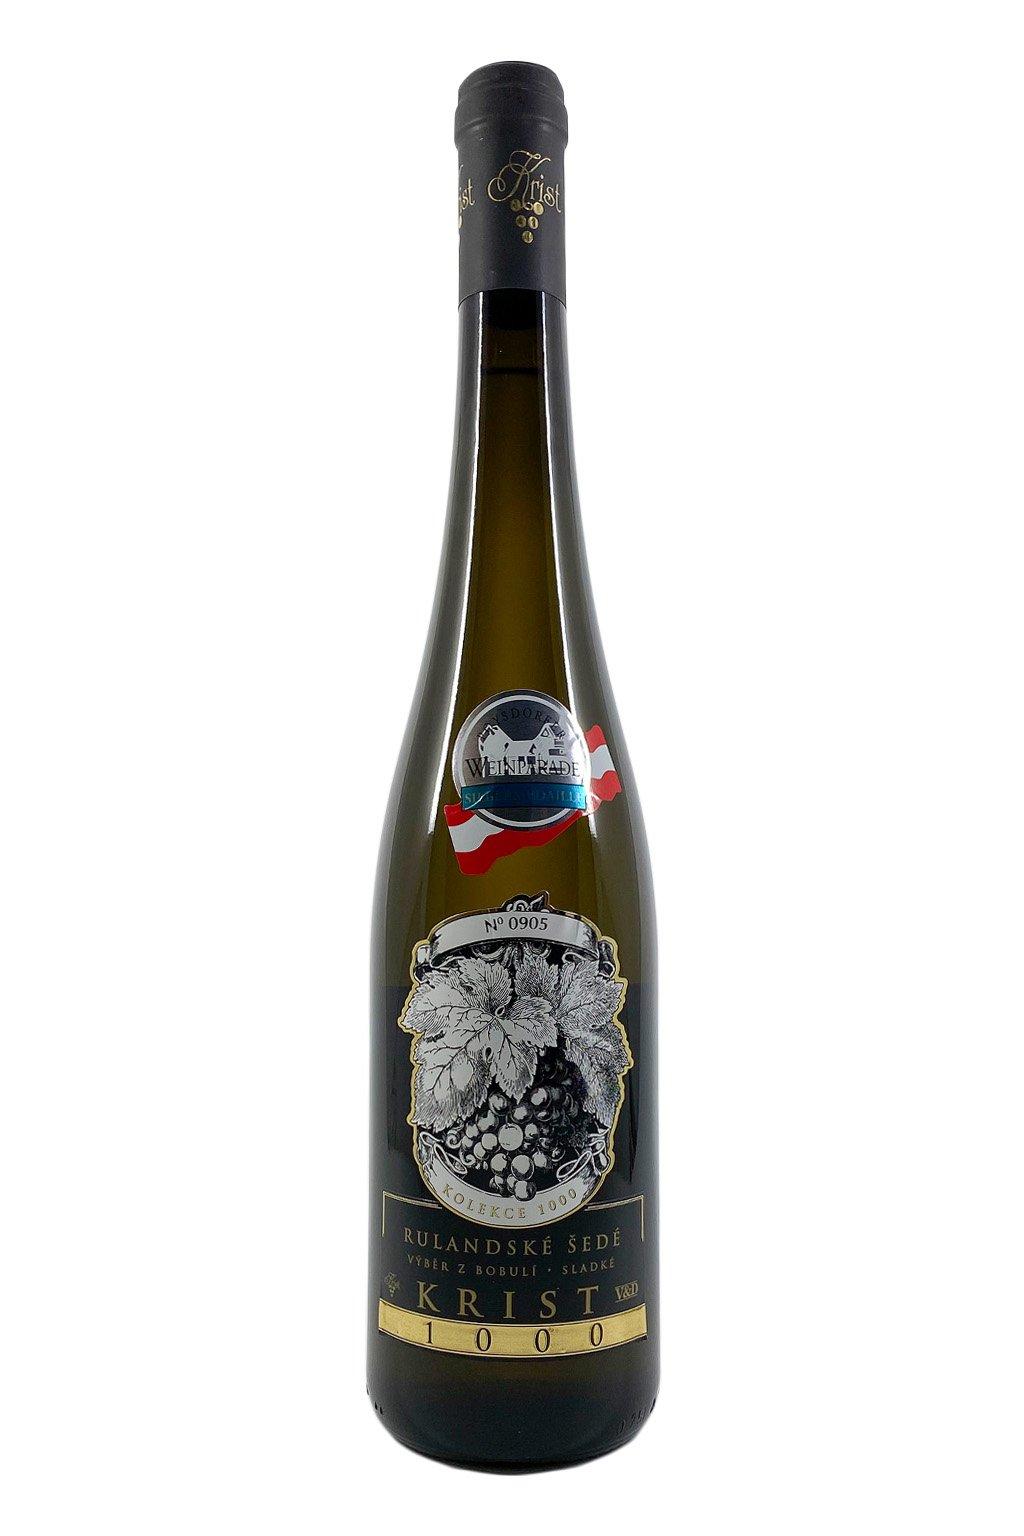 vinoadestilaty 0092 Vrstva 17